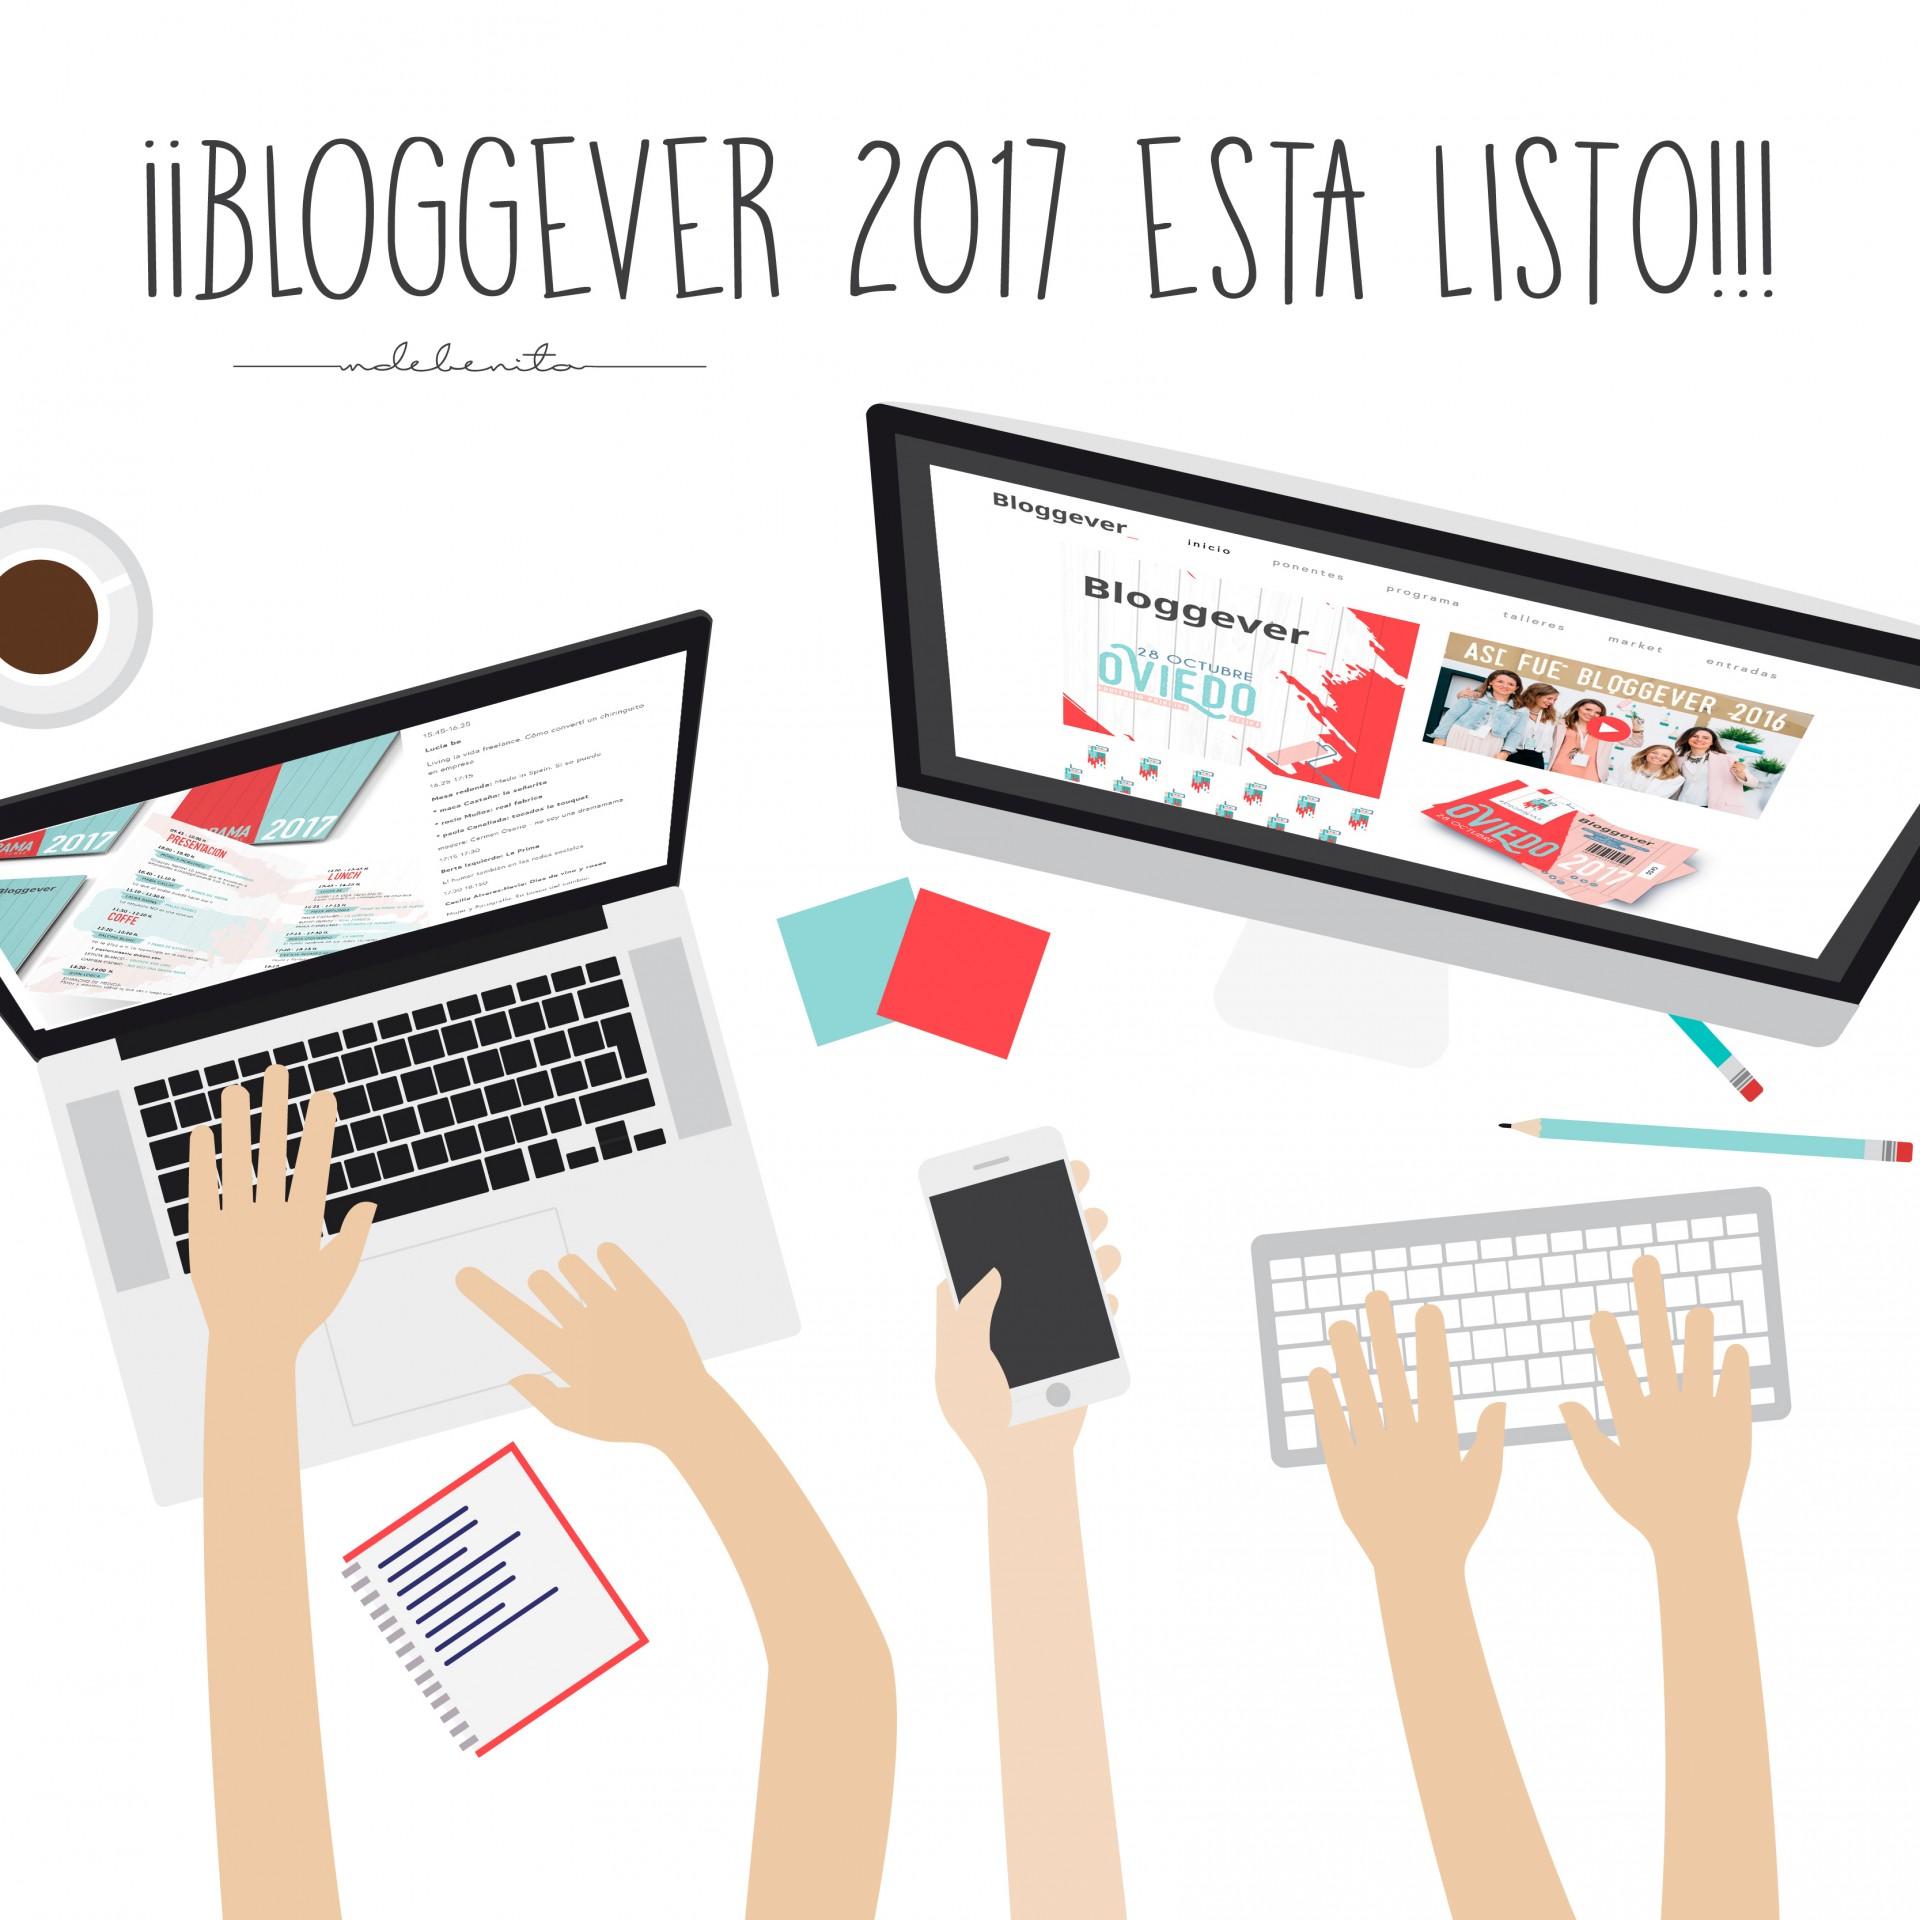 bloggever-imagen-instagram-mdebenito-1